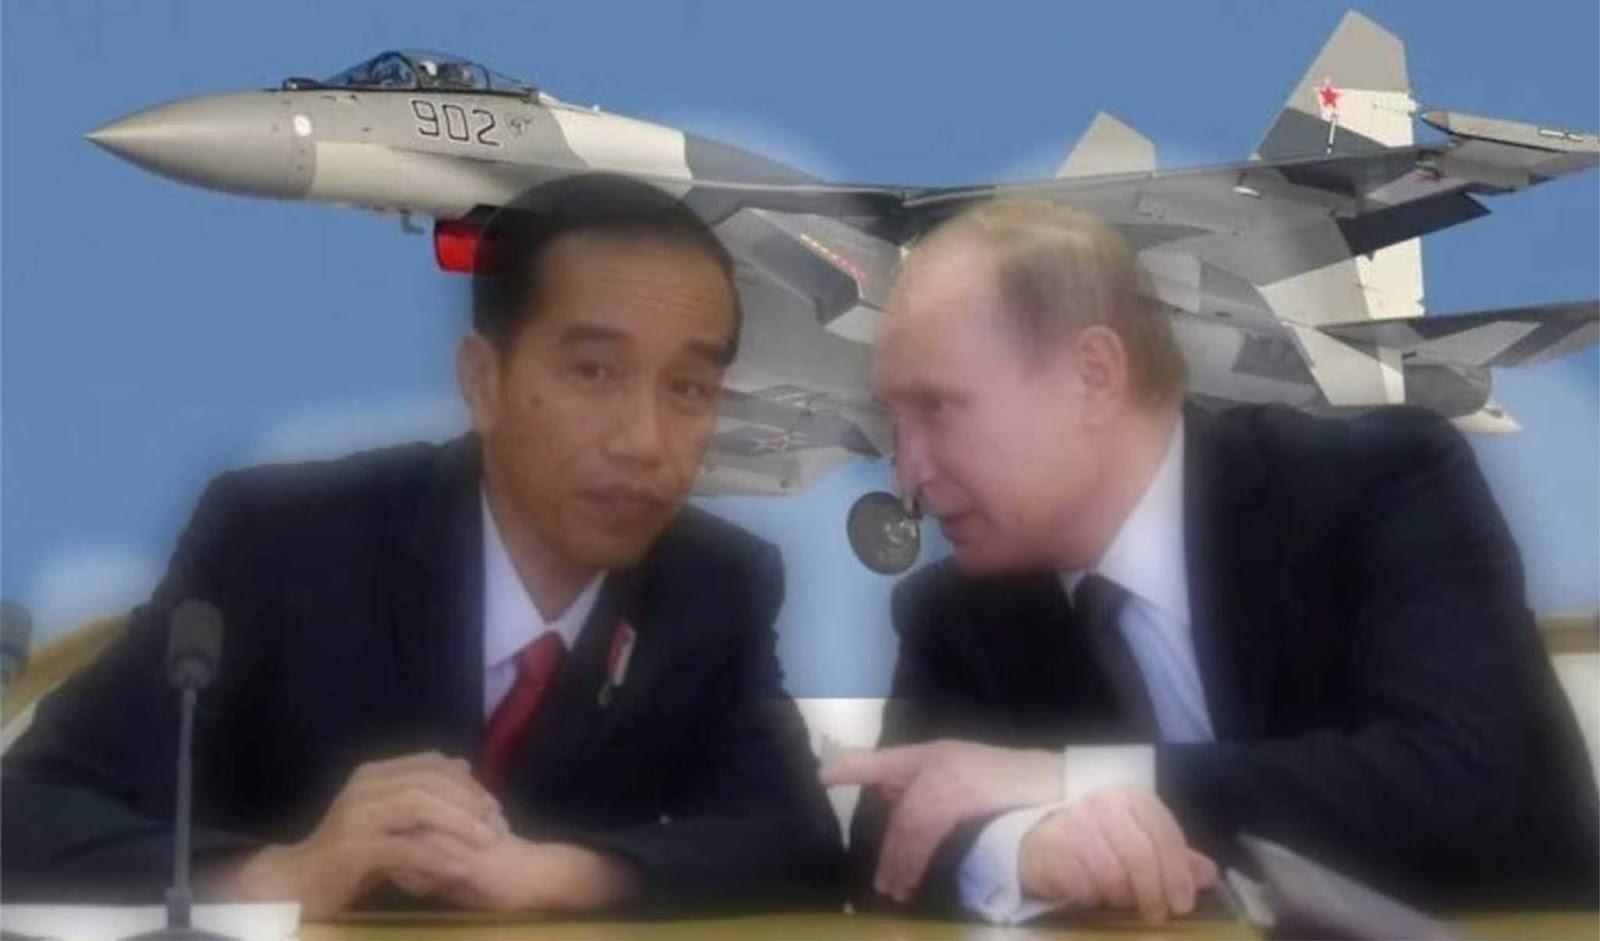 Pembelian Sukhoi Su-35 terus berlanjut dengan penjadwalan ulang